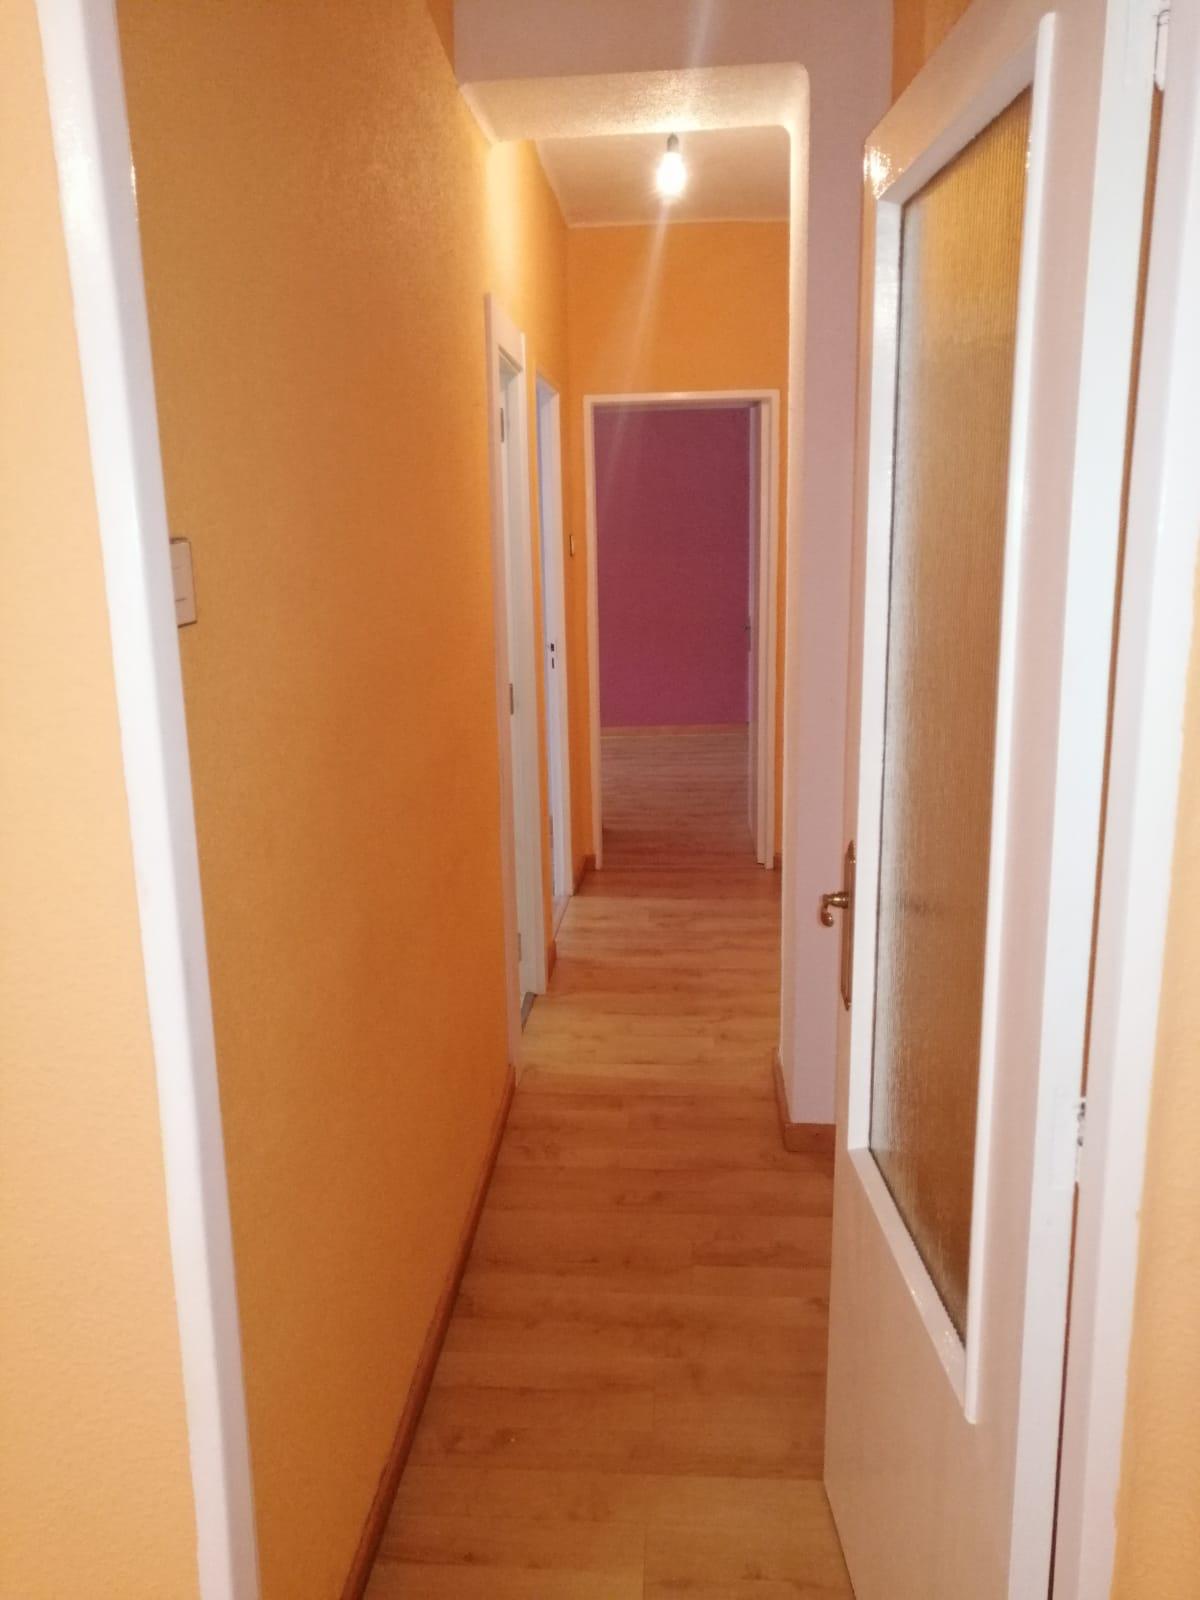 Piso de tres dormitorios junto a corte inglés (REF: 53) - foto 12 cfbcedc2-a40a-48ec-a529-3a21406a047d.jpg